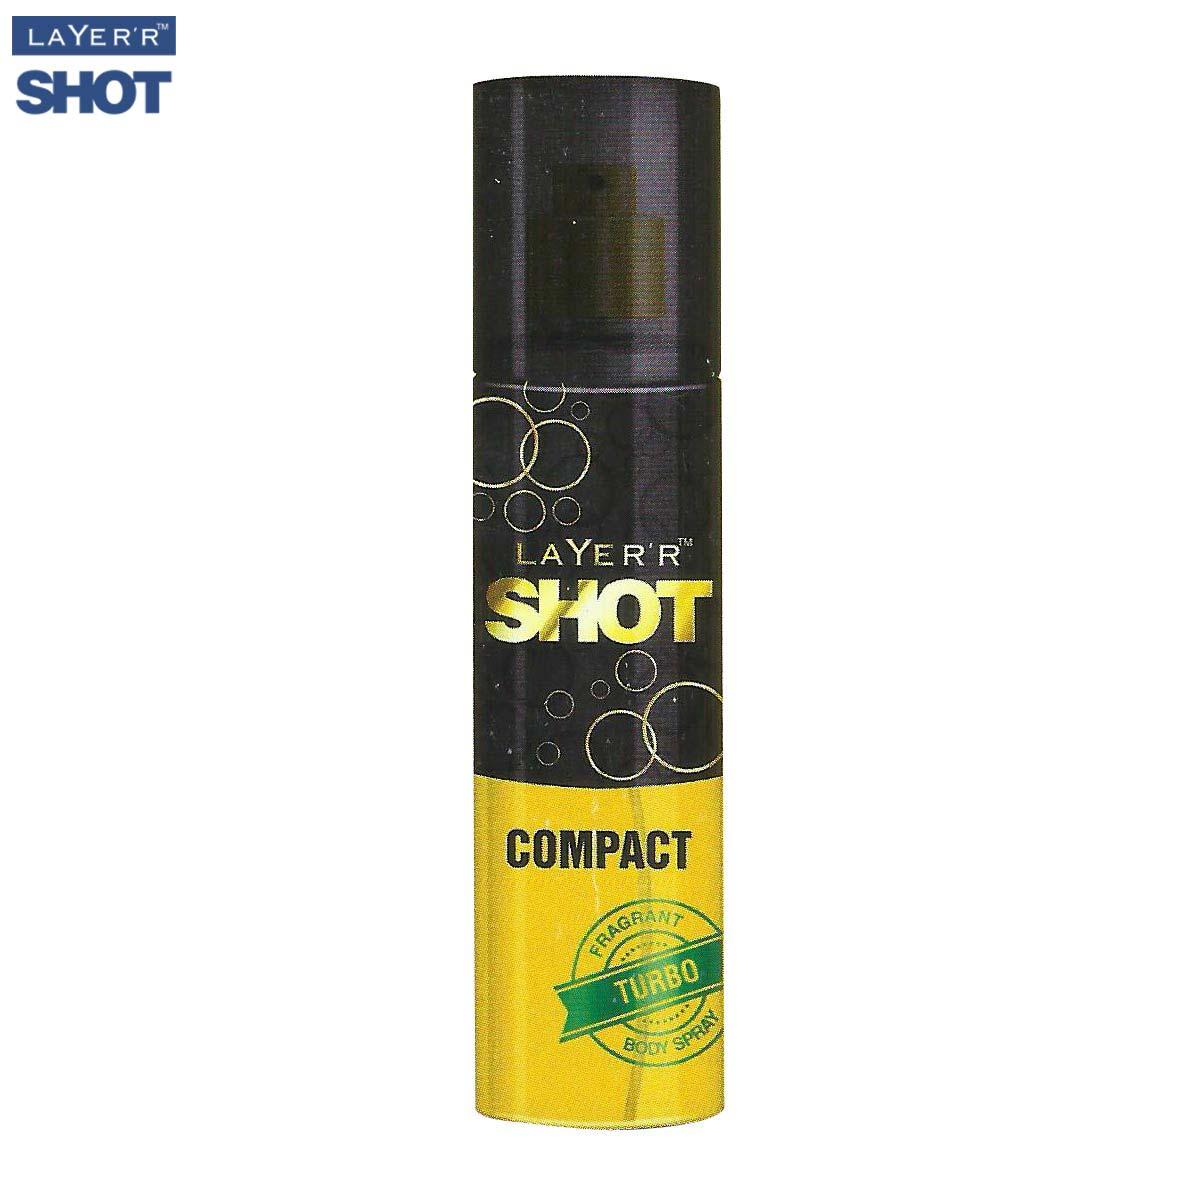 Layerr Shot Compact Turbo Body Spray